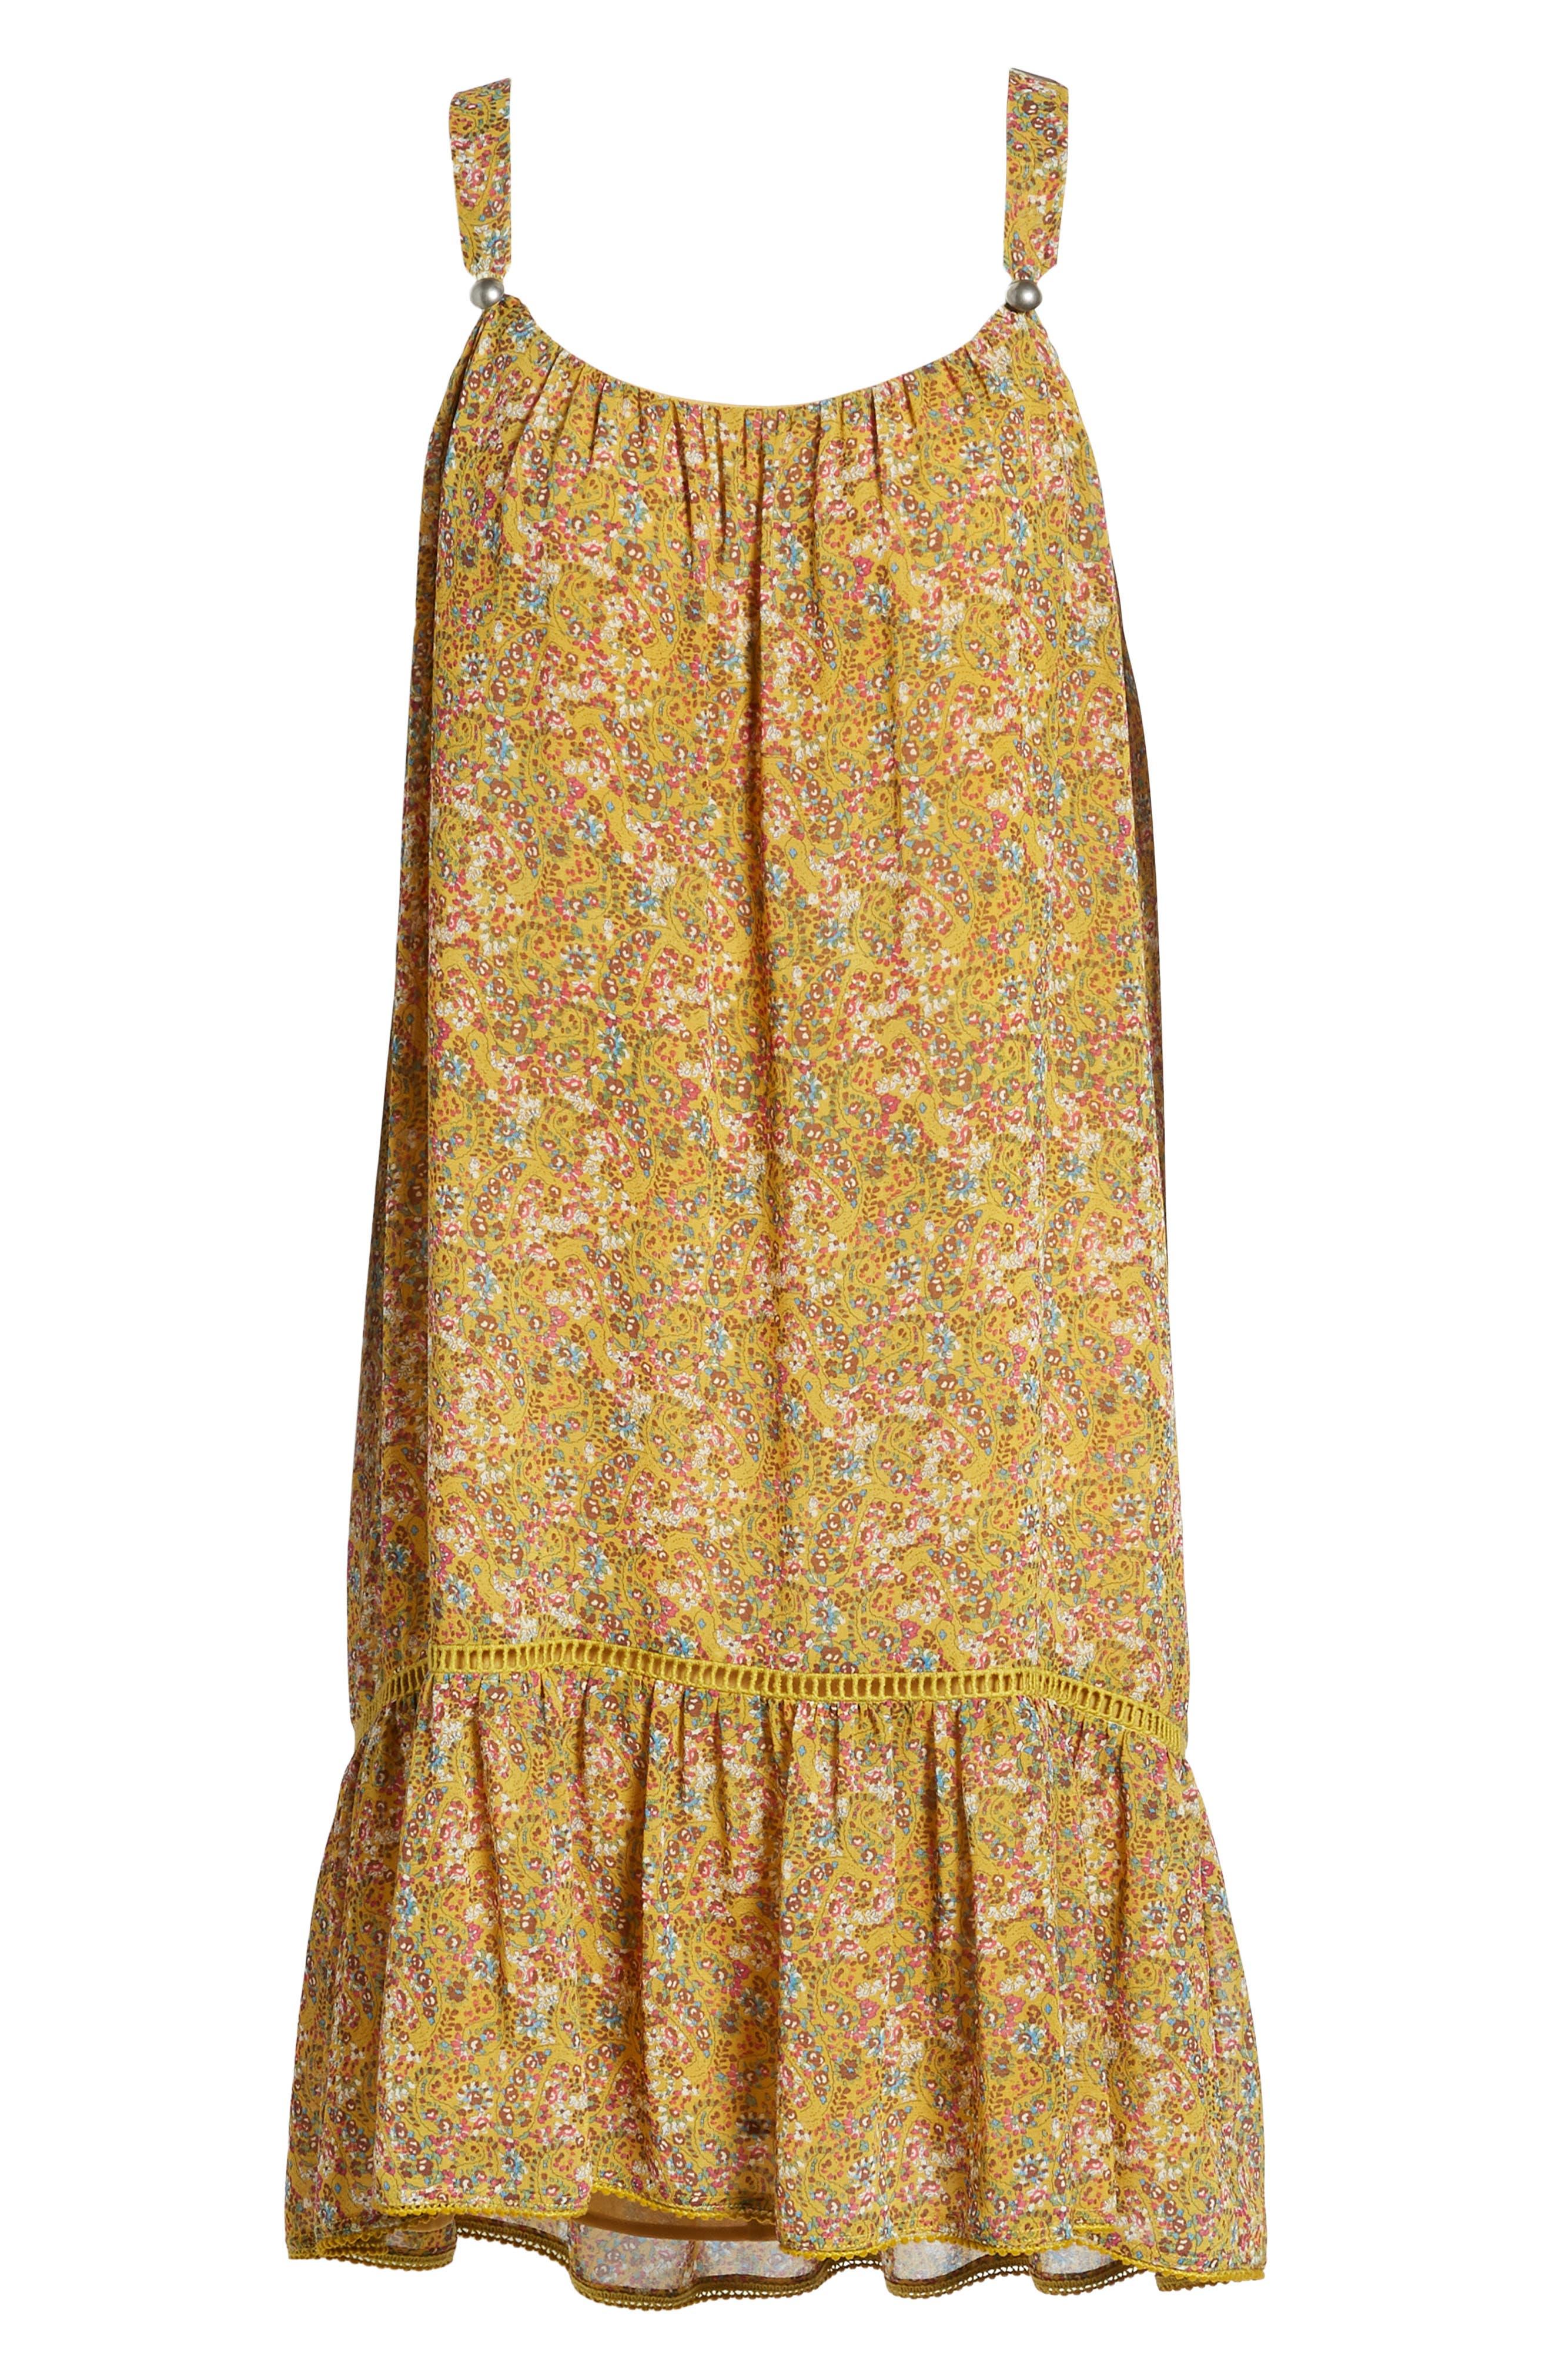 Madison Floral Sundress,                             Alternate thumbnail 6, color,                             YELLOW MULTI